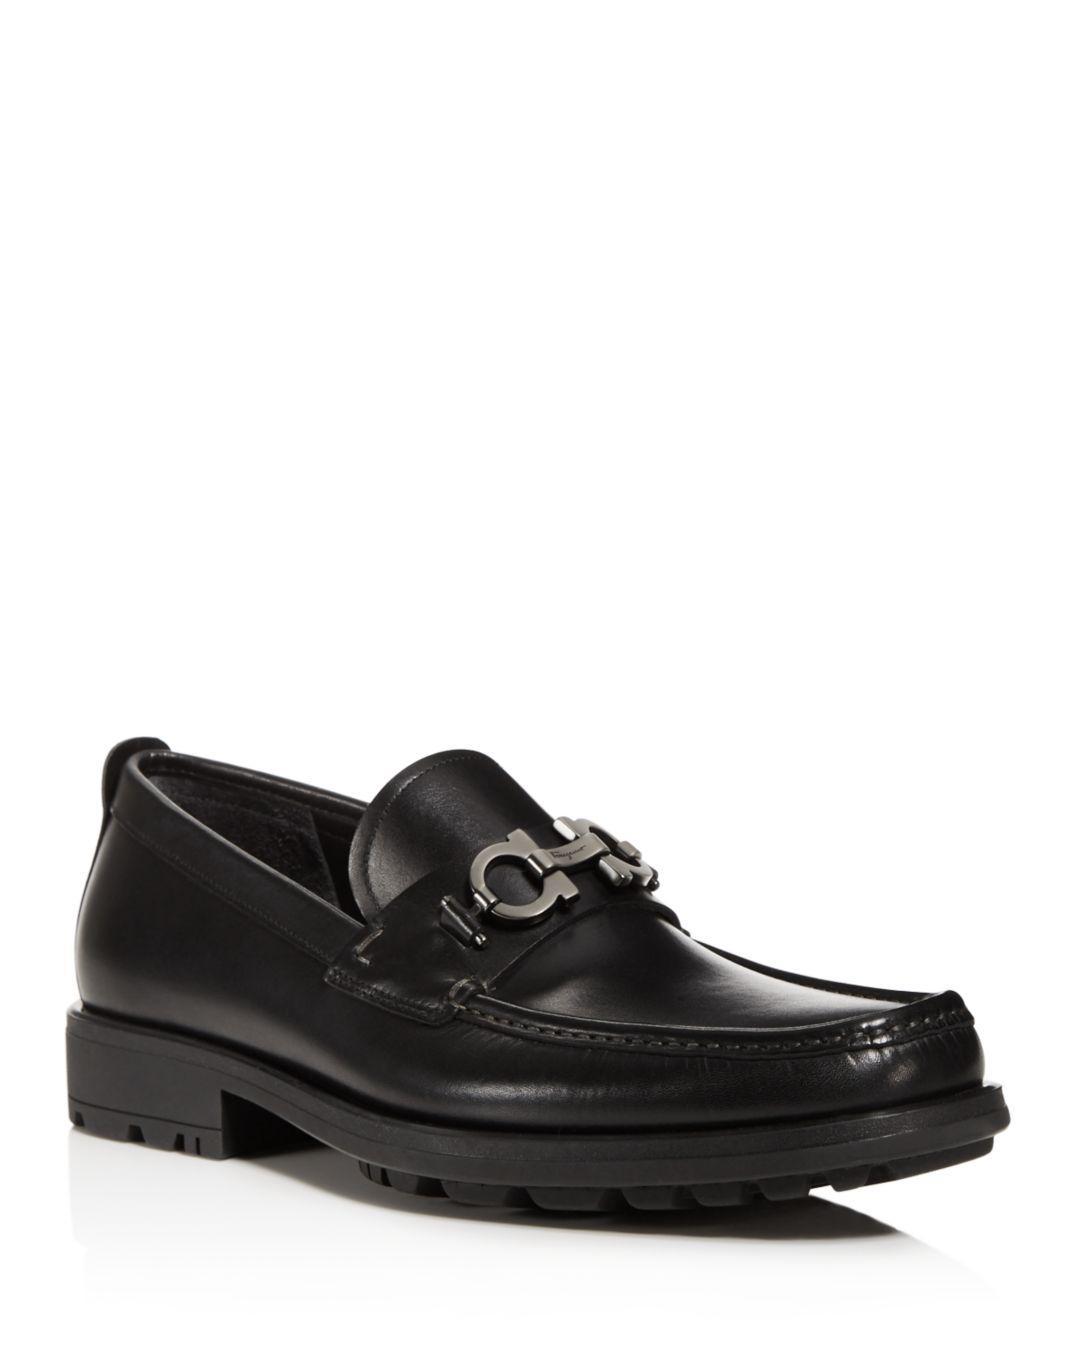 938df9eedbc Lyst - Ferragamo David Leather Loafers in Black for Men